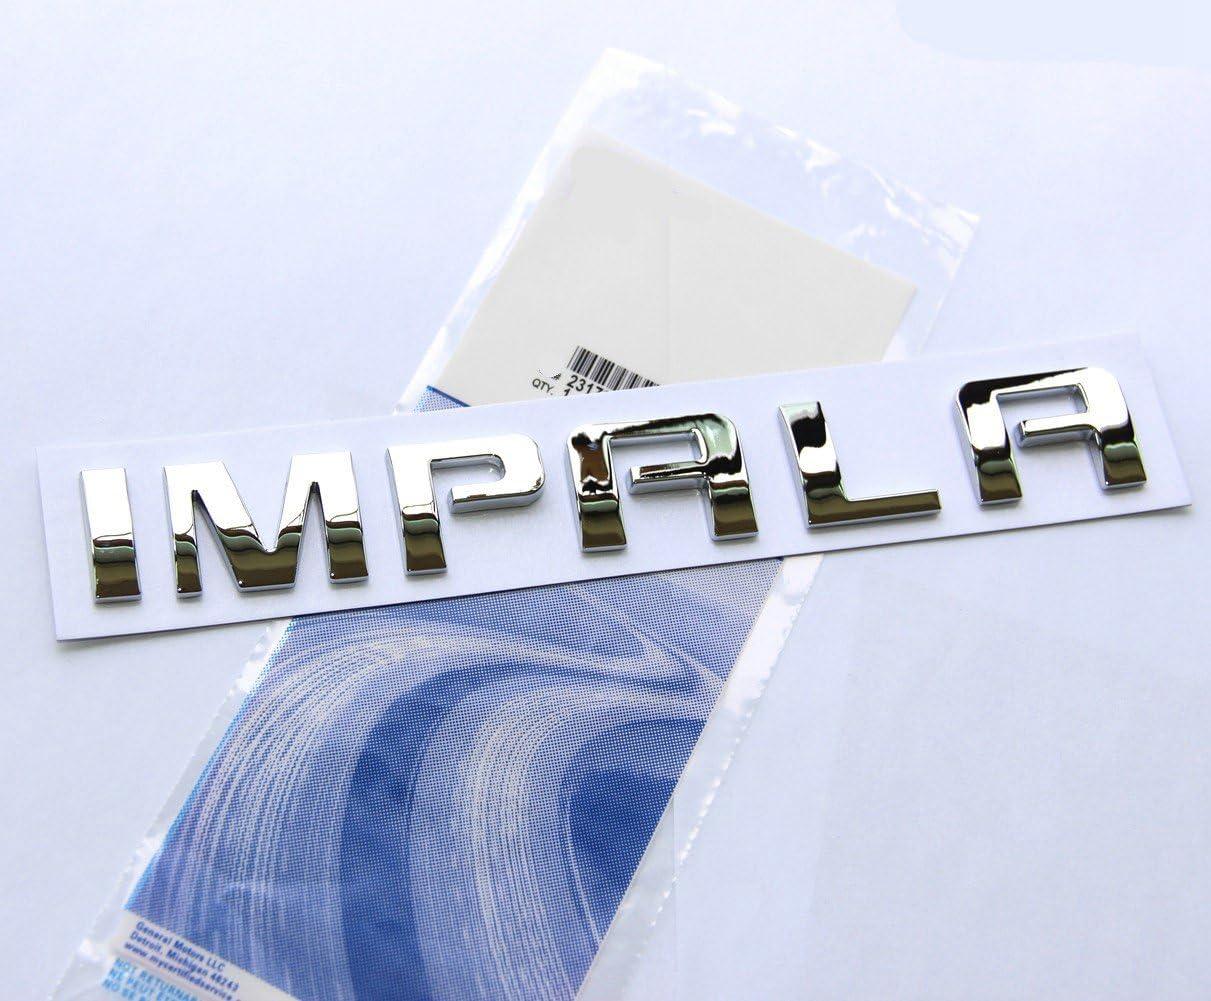 Aftermarket Compatible//Replacement for Chrome LT Emblem GMC Chevrolet Silverado Tahoe Express Impala Malibu Avalanche